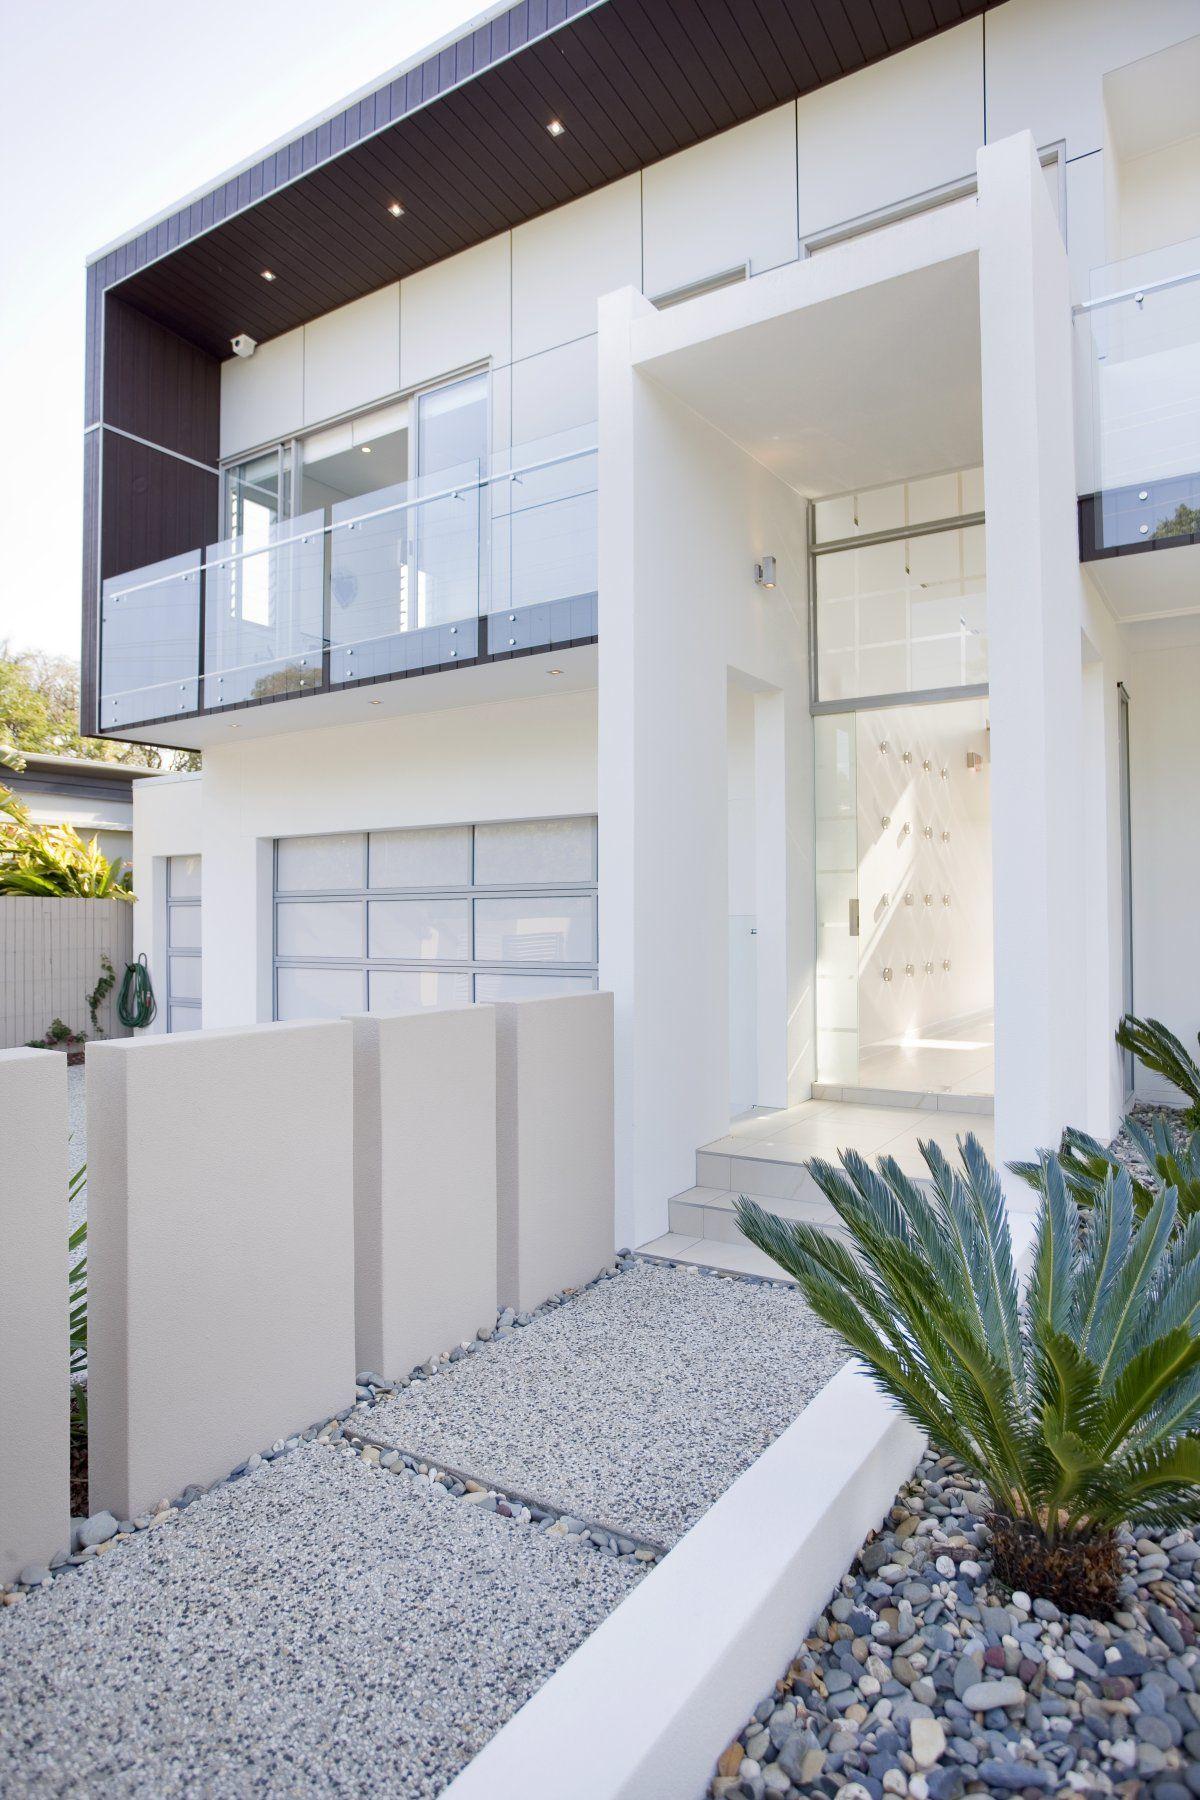 Bh 220712 06 Contemporist Architecture House Entrance Design